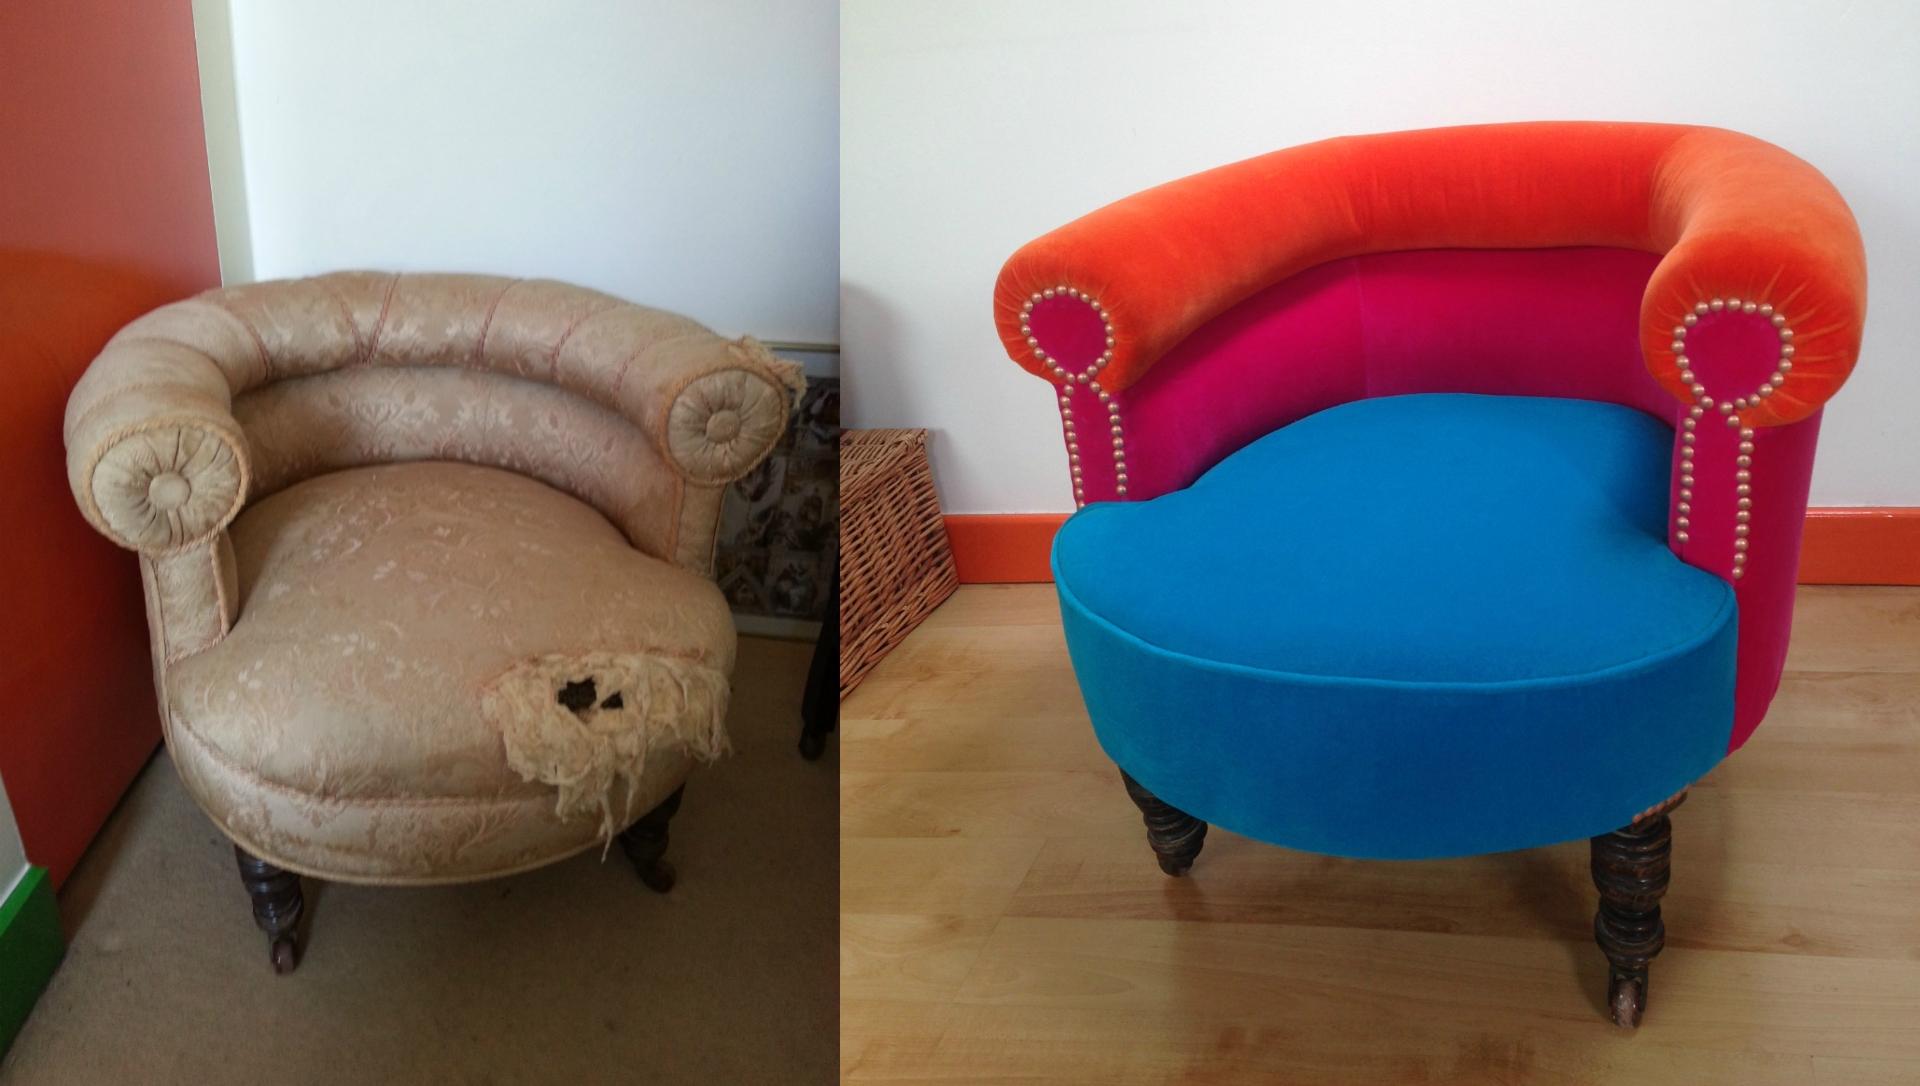 Ladies' Round Chair